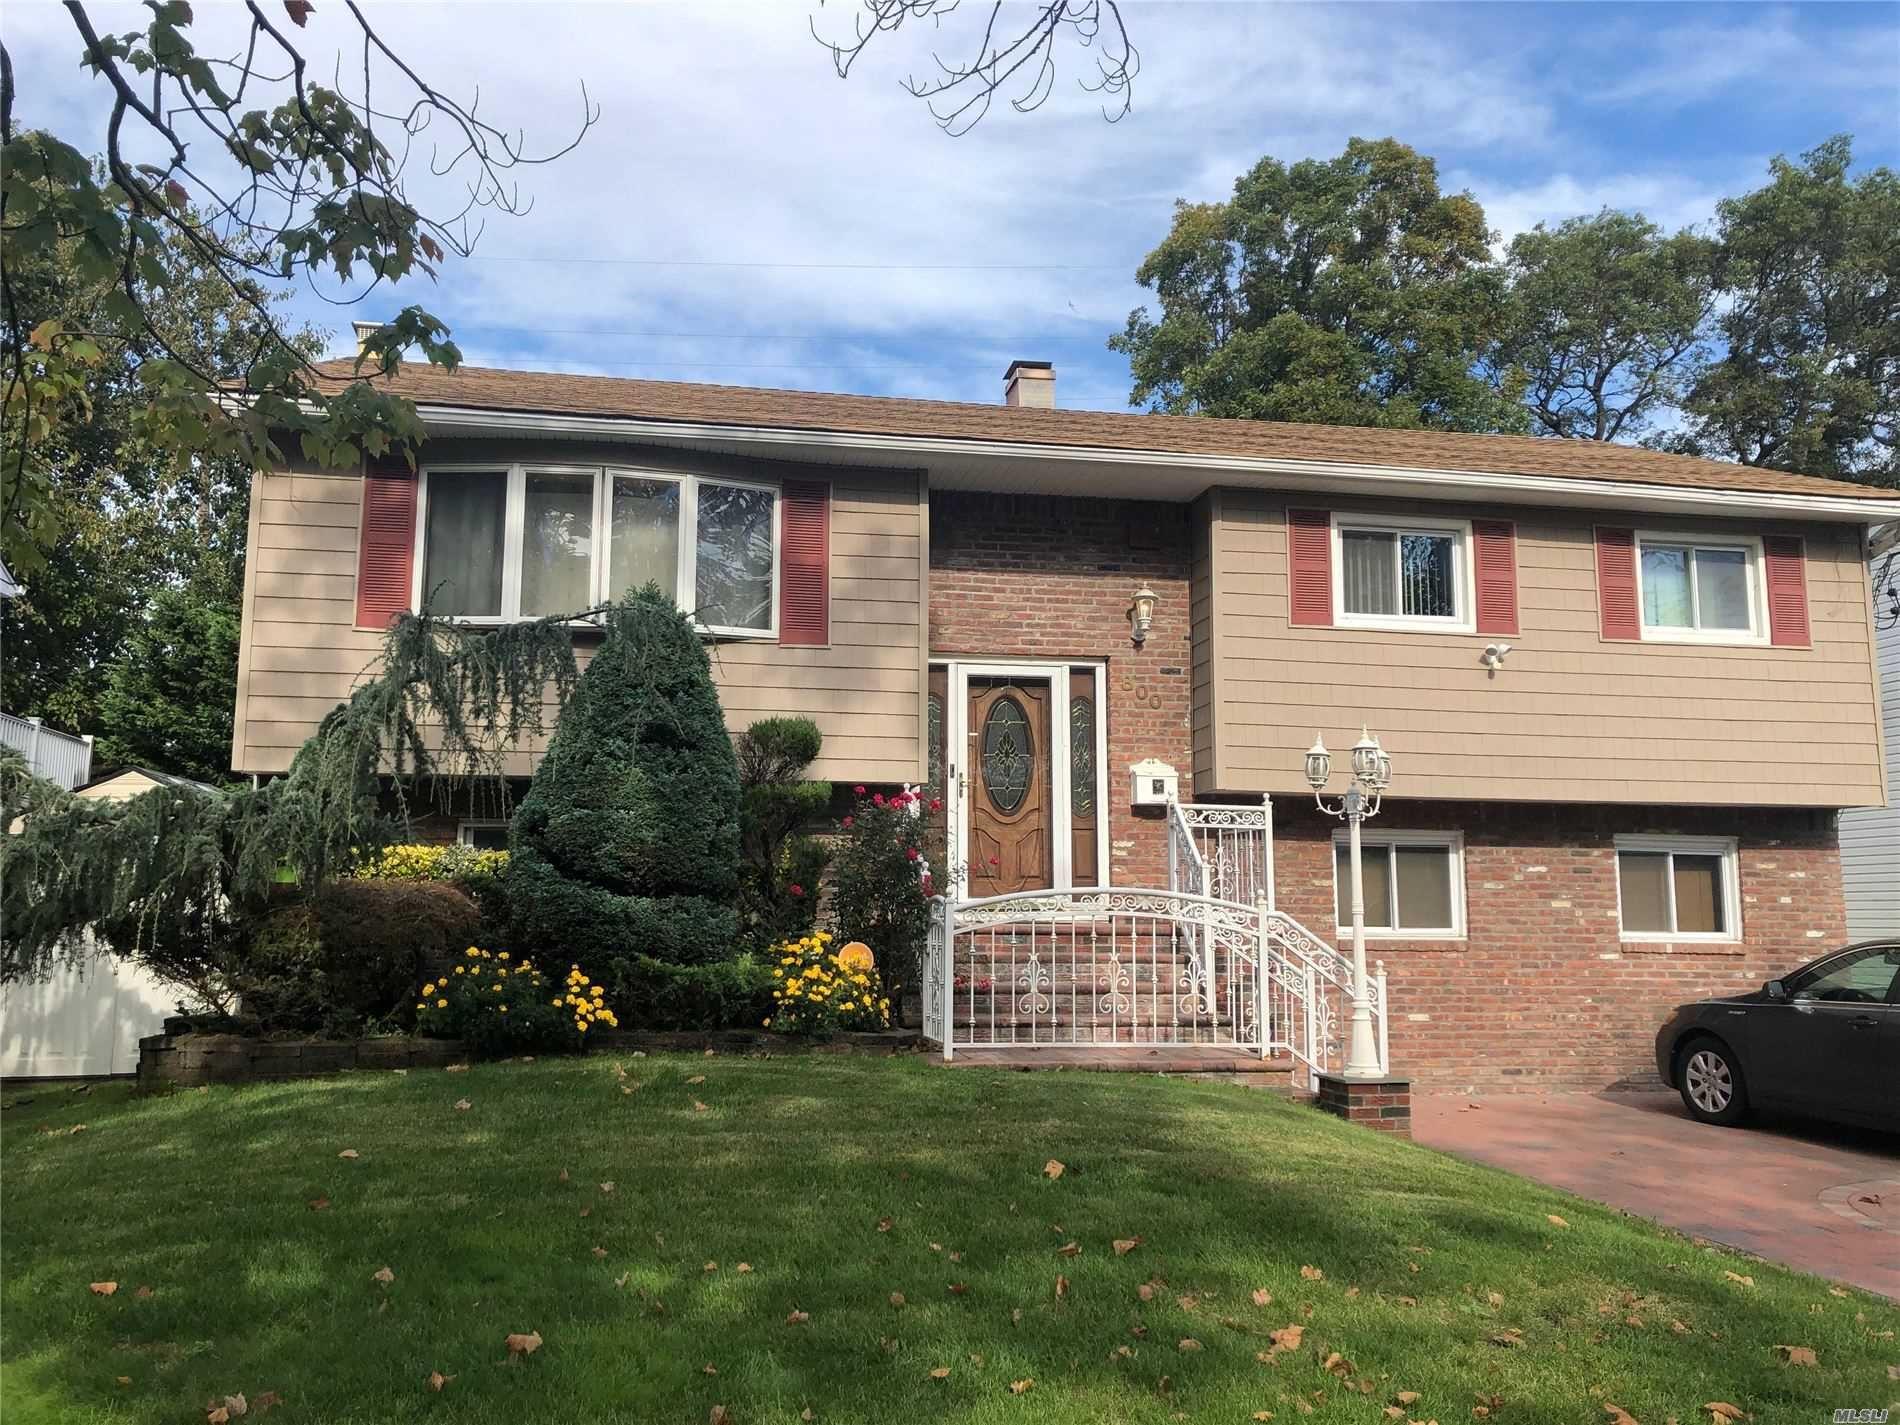 800 Iris Place, West Hempstead, NY 11552 - MLS#: 3217379